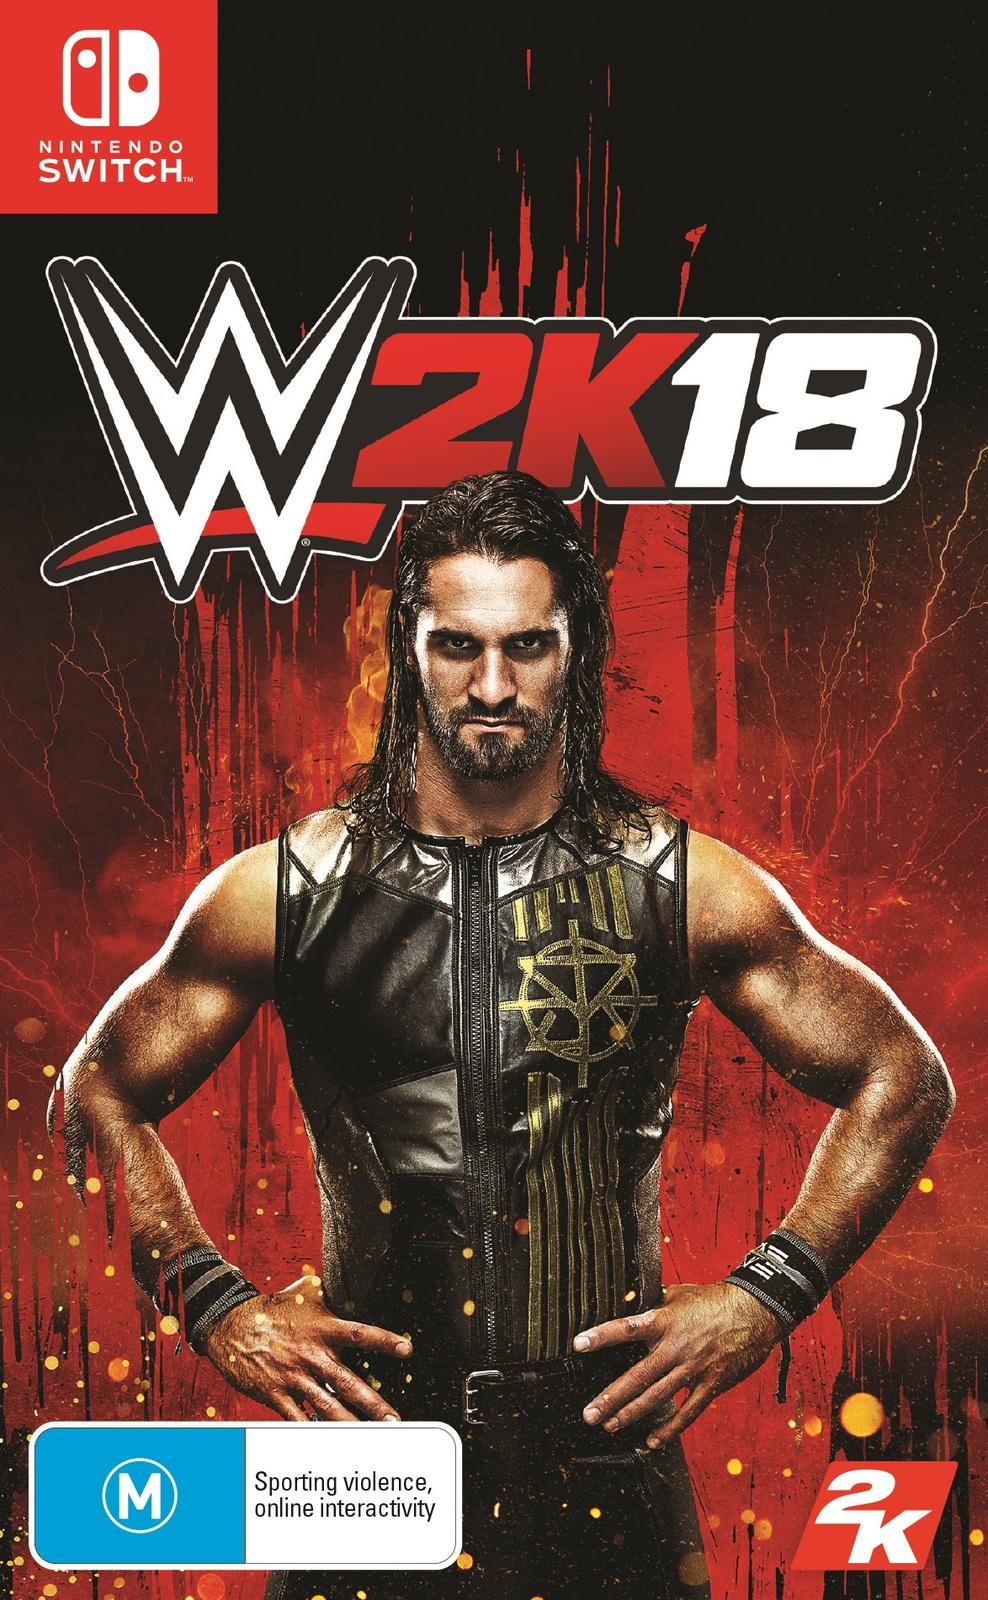 WWE 2K18 for Nintendo Switch image